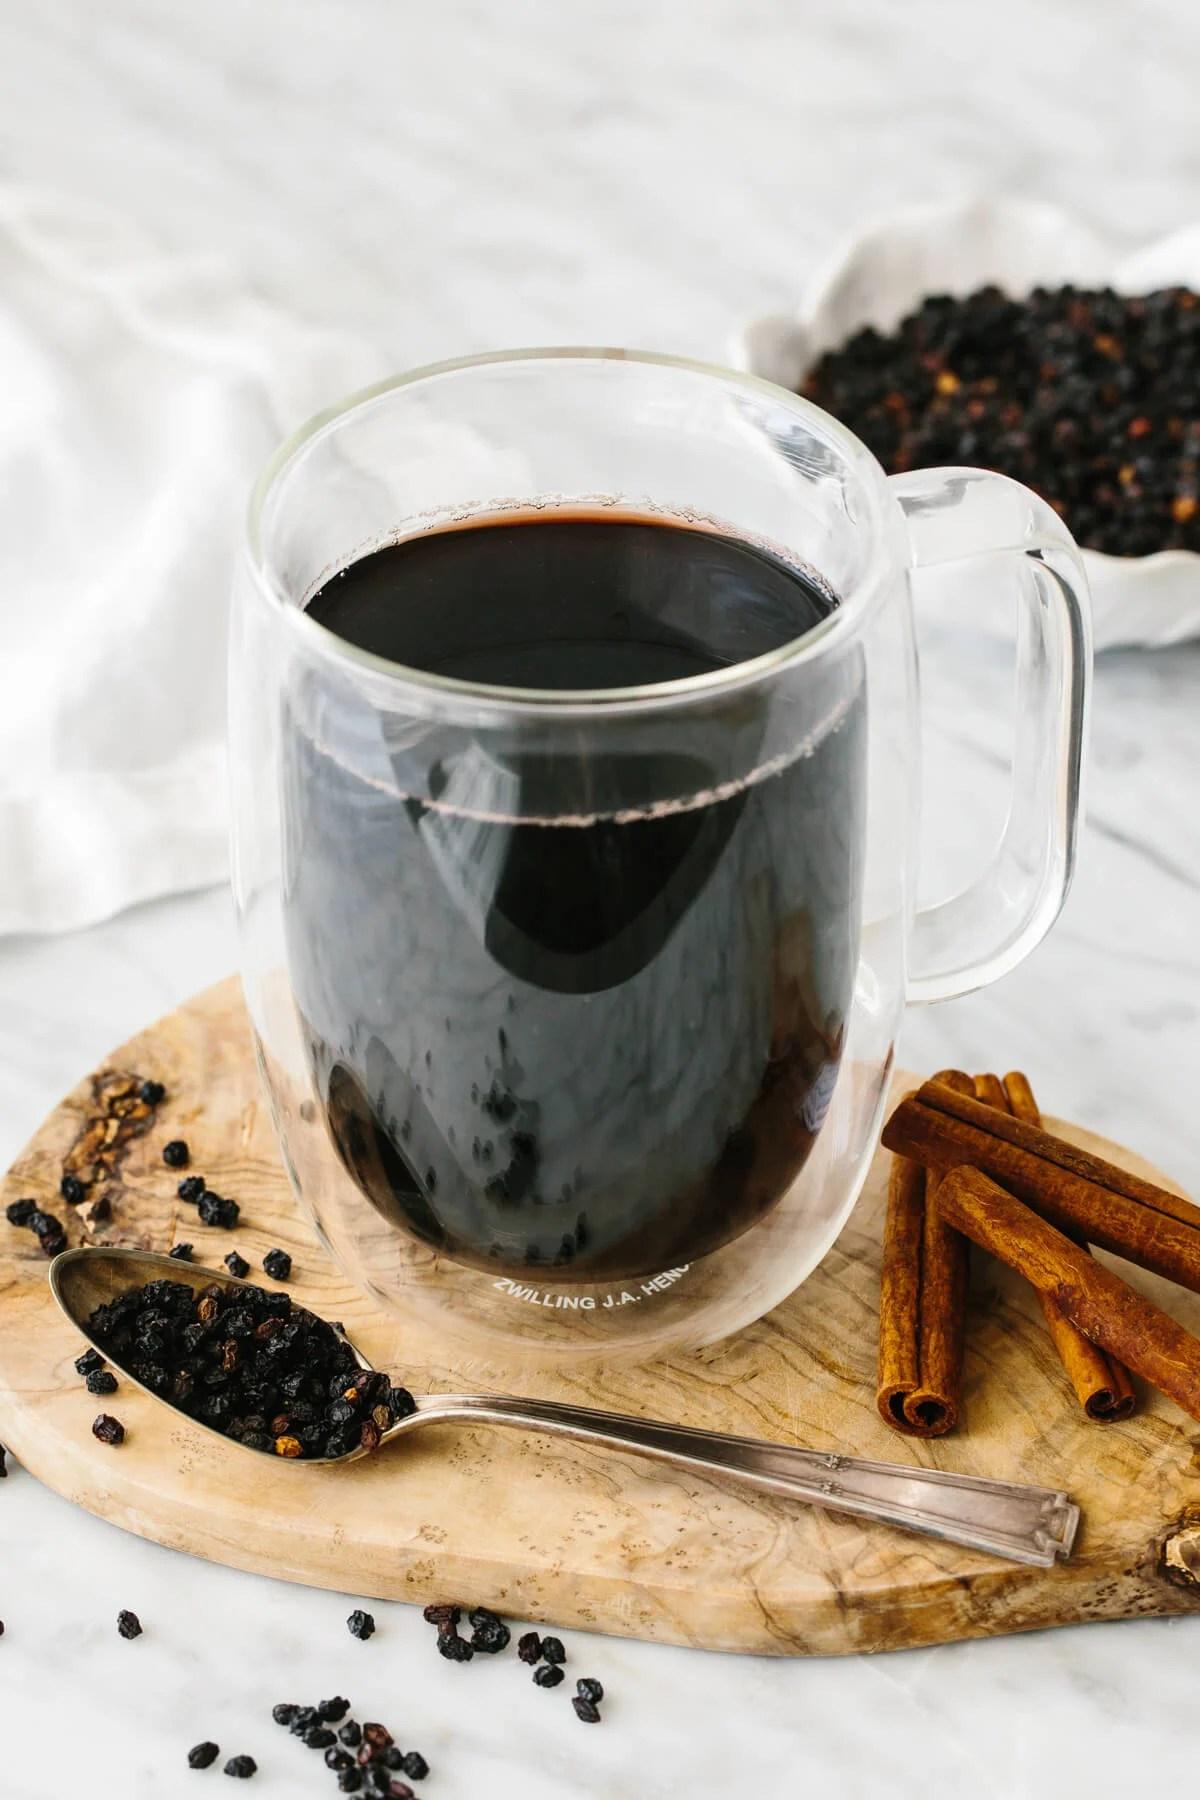 Elderberry tea in a glass next to dried elderberry and cinnamon sticks.